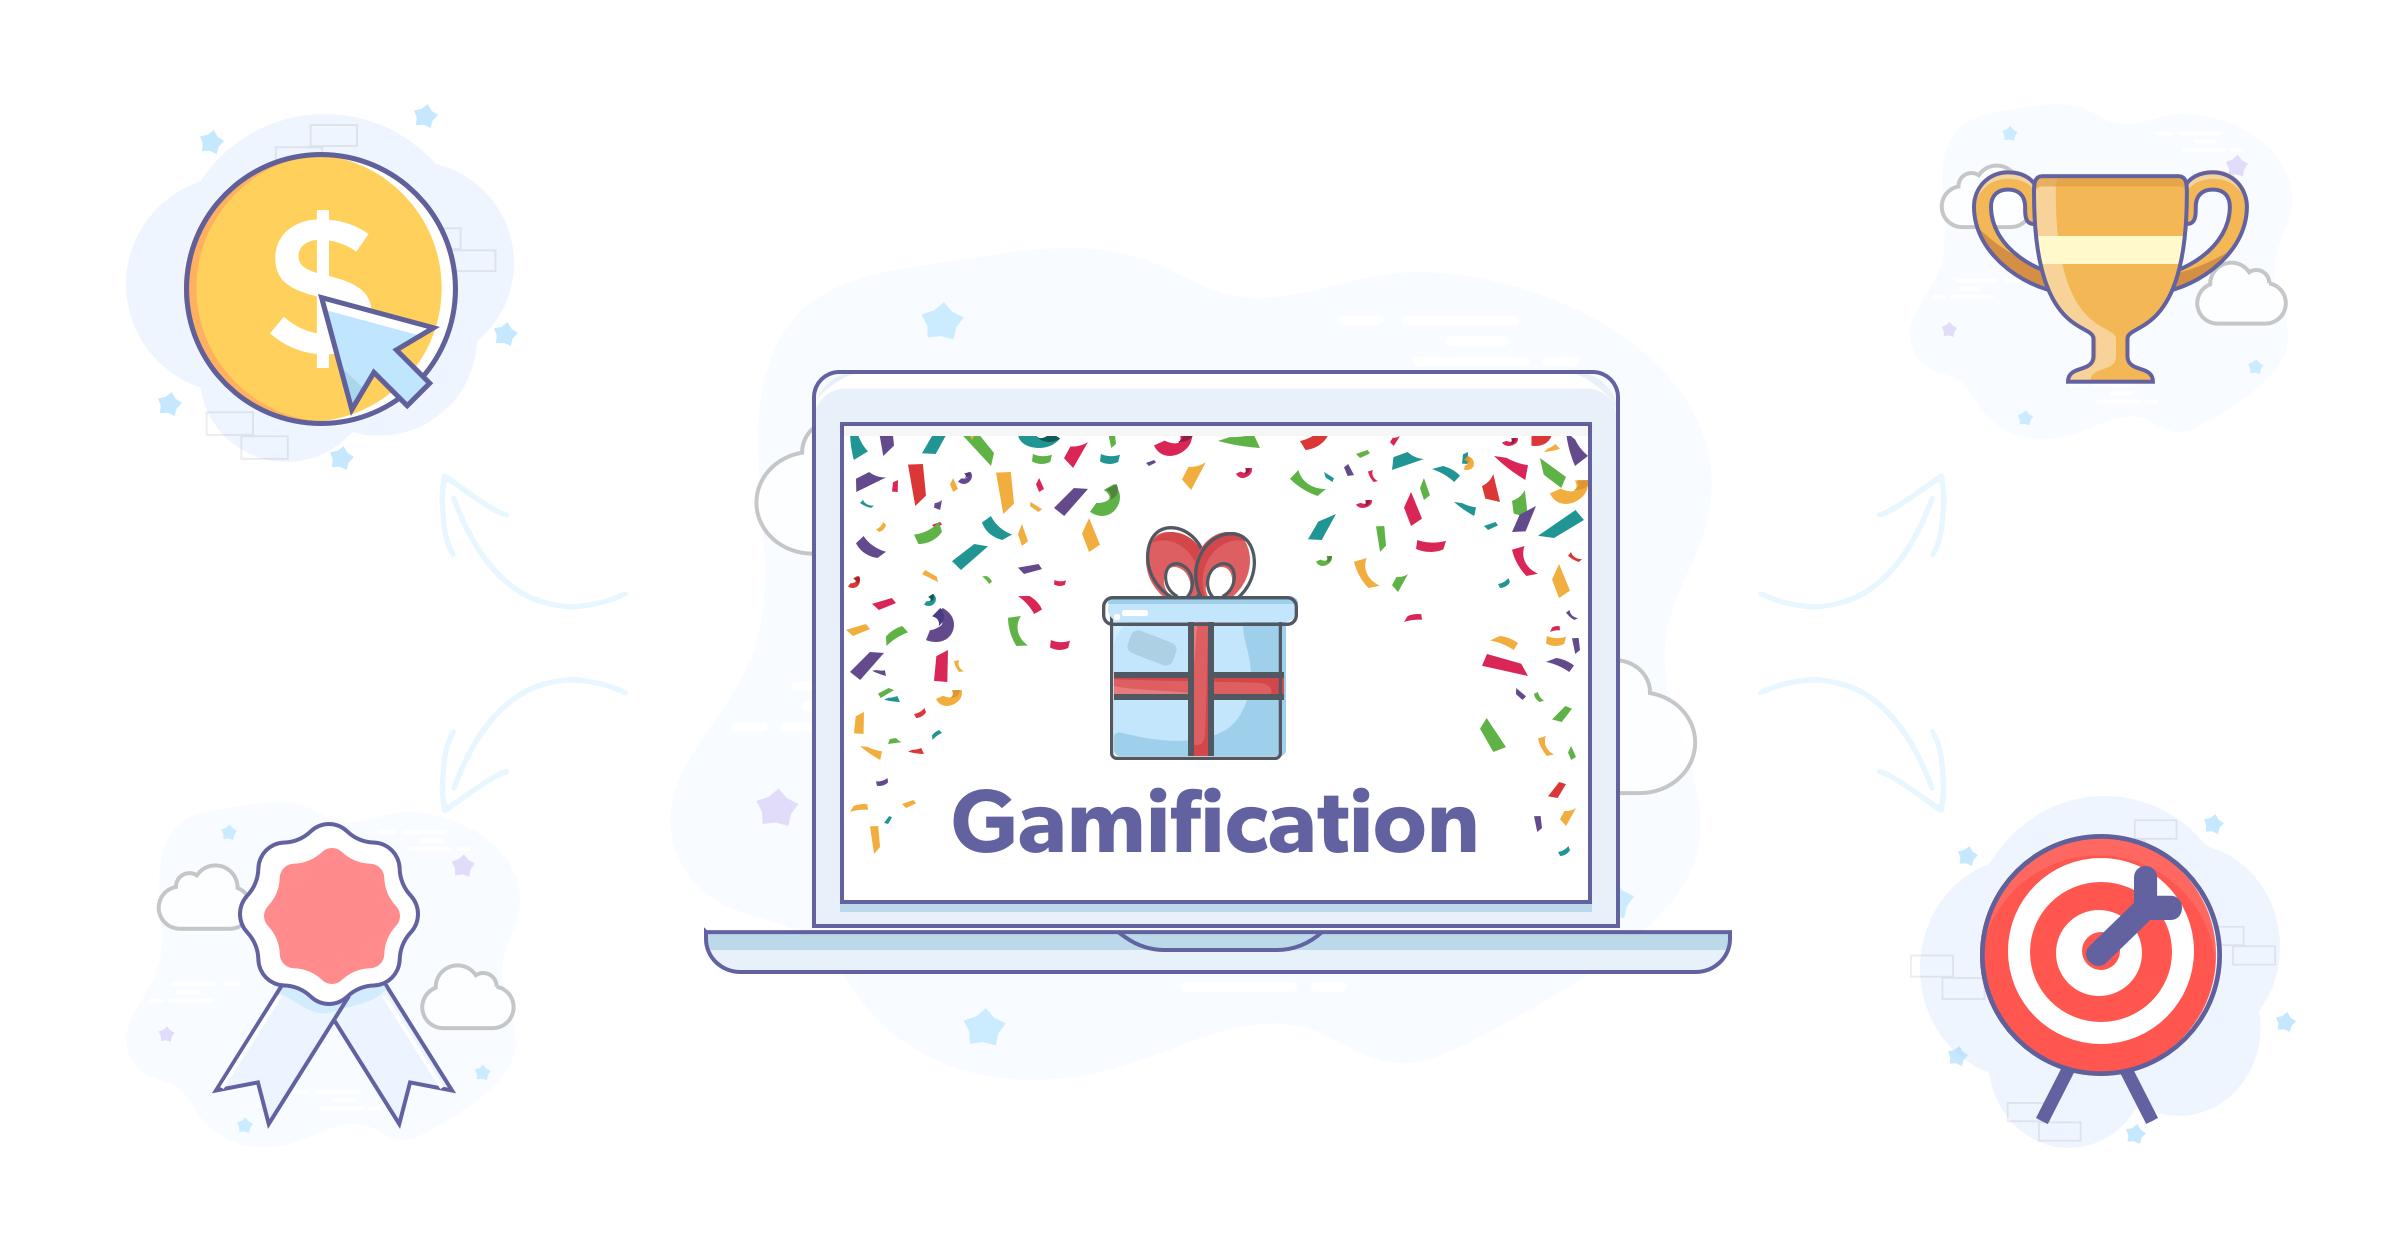 cover gamification v1 - گیمیفیکیشن در تبلیغات؛ زمین بازی برای جذب مشتری